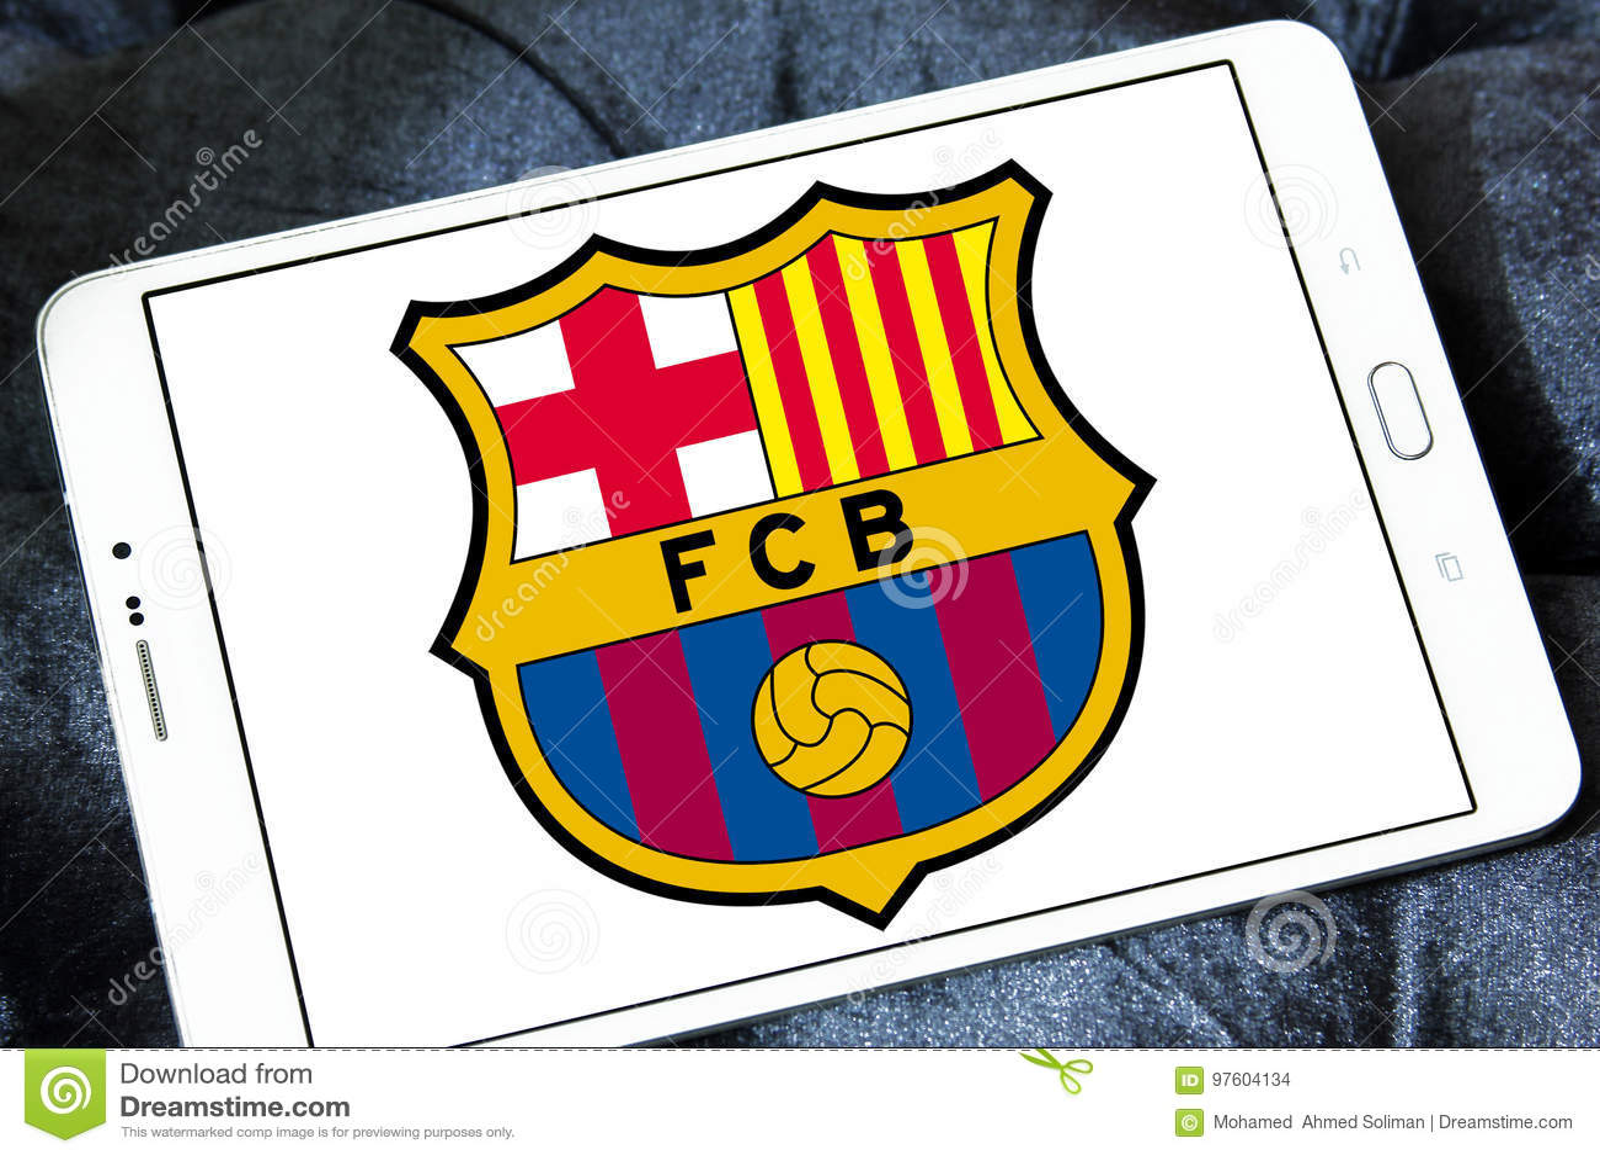 Fc Barcelona Soccer Club Logo Editorial Stock Image Image Of